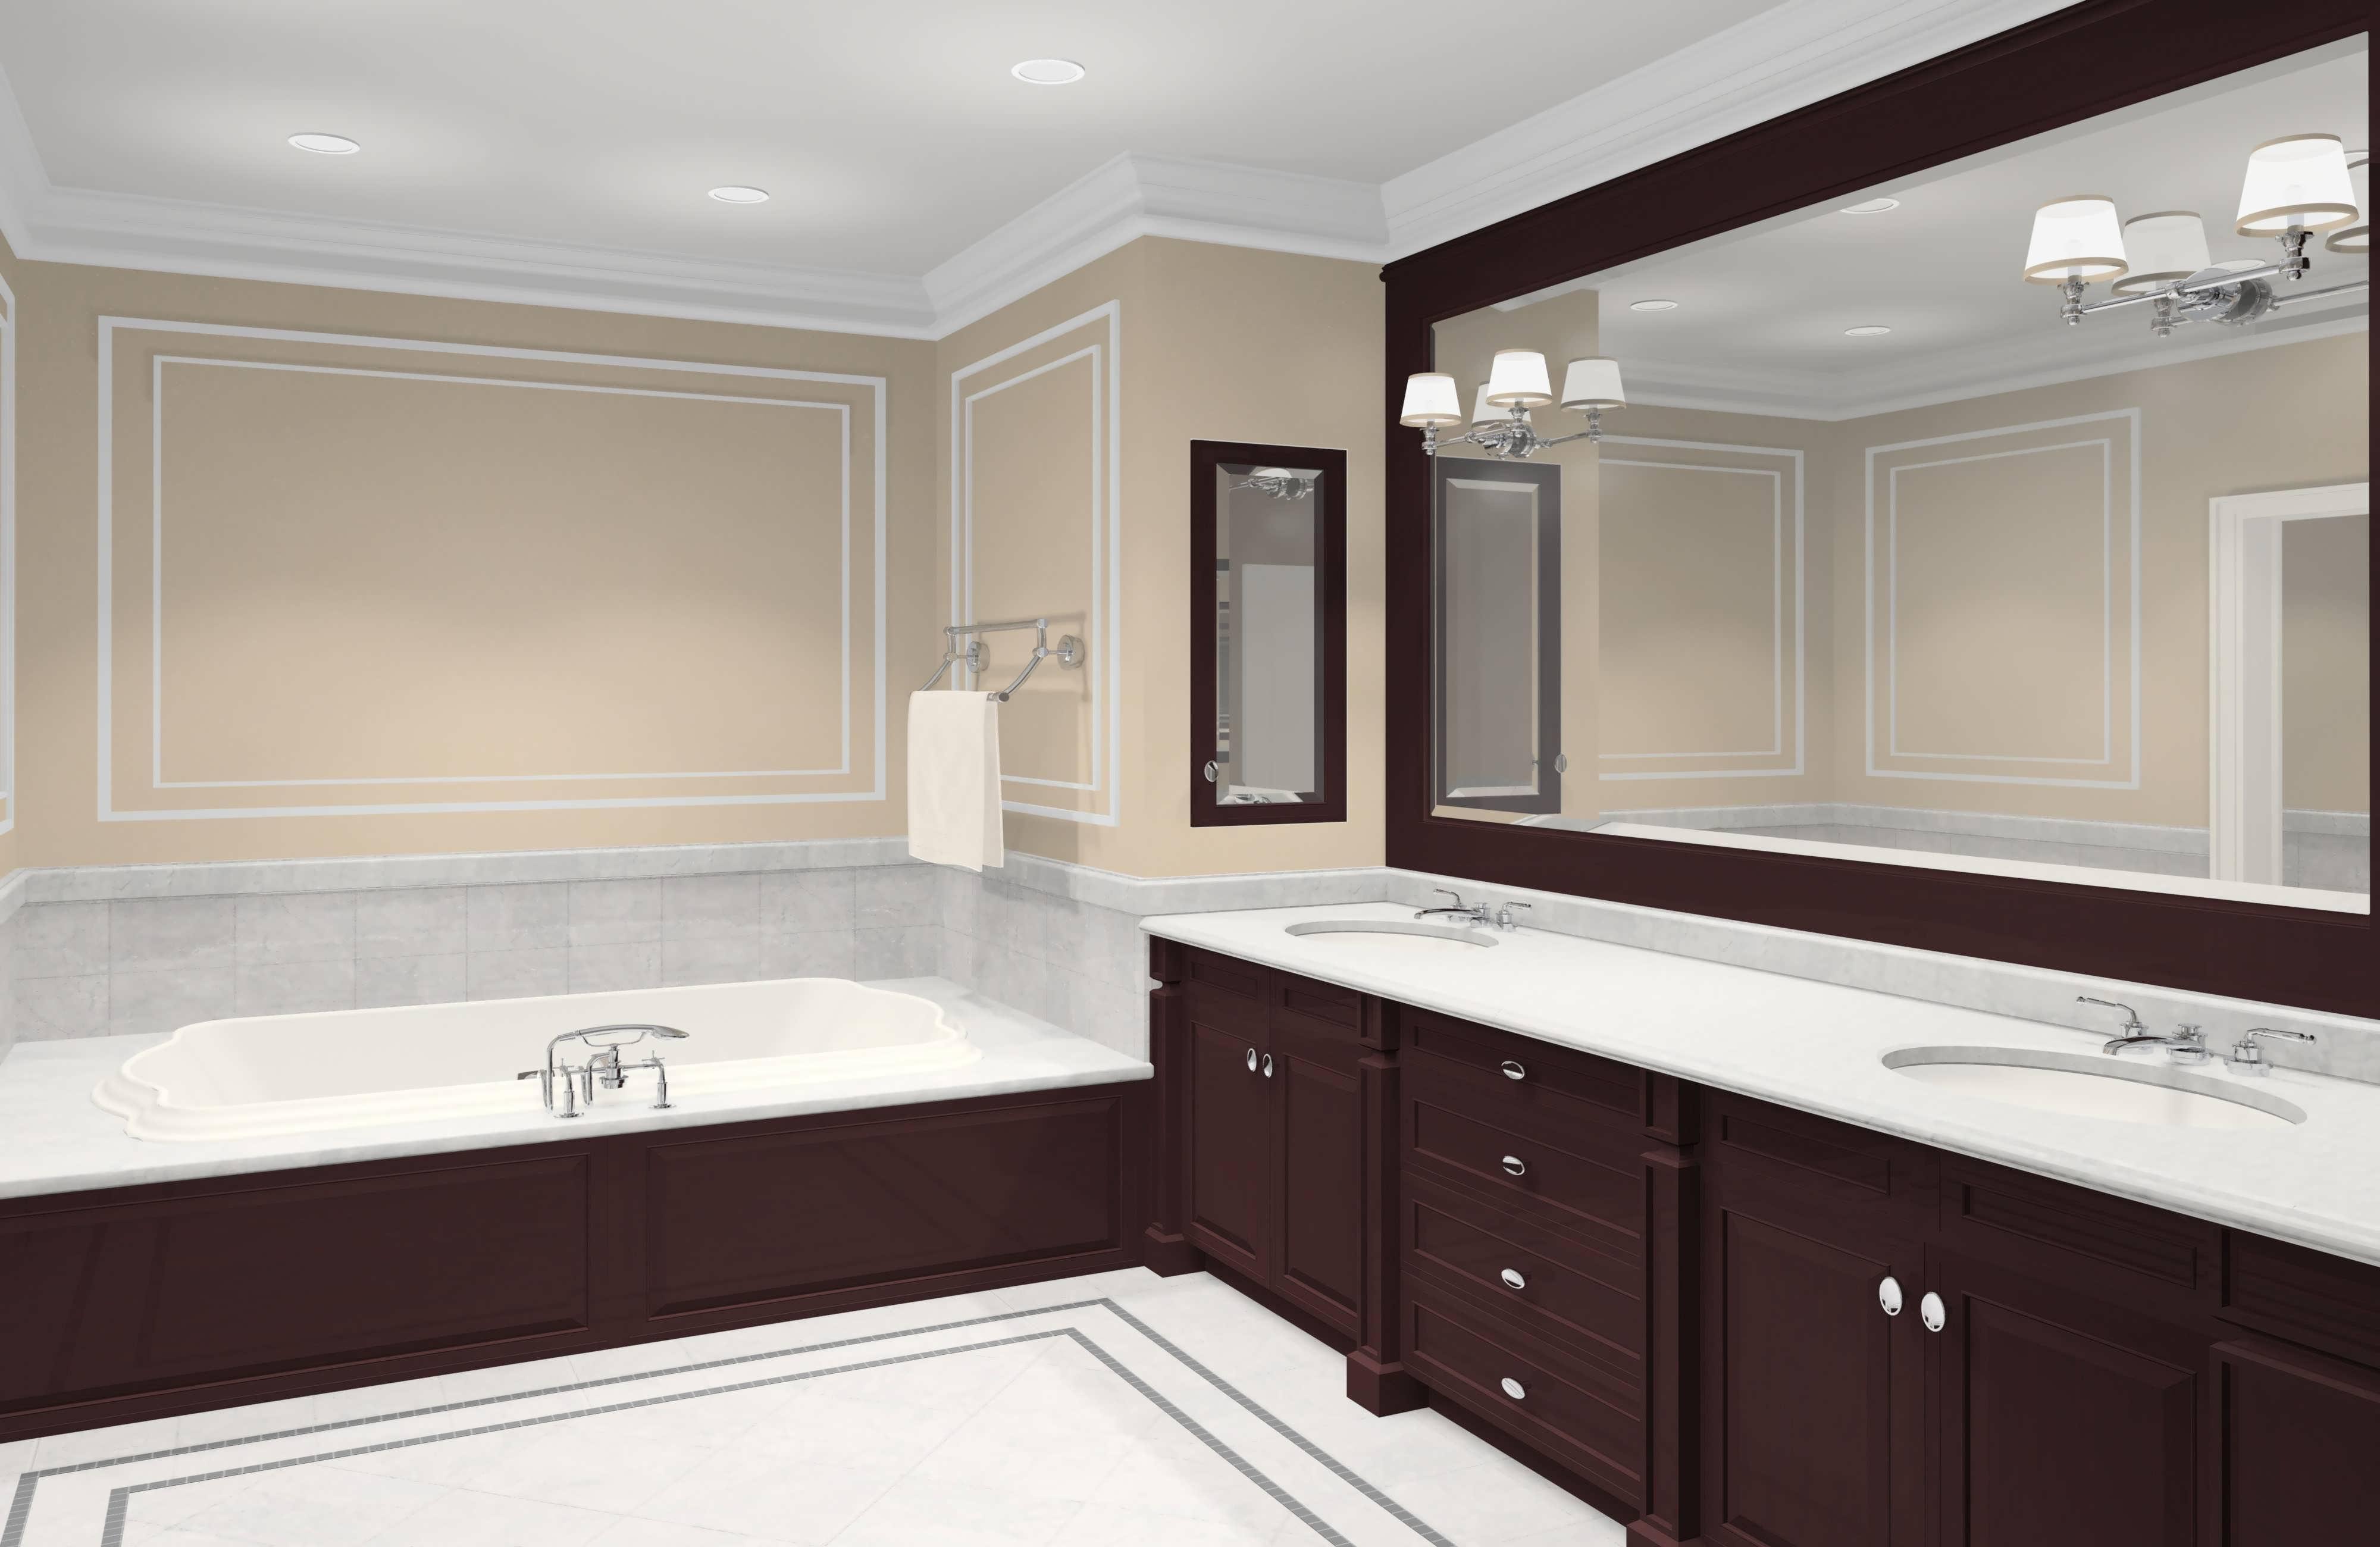 Bathroom Cabinets : 24 X 30 Mirror Double Vanity Mirror Bathroom In Large Framed Bathroom Wall Mirrors (Image 3 of 20)